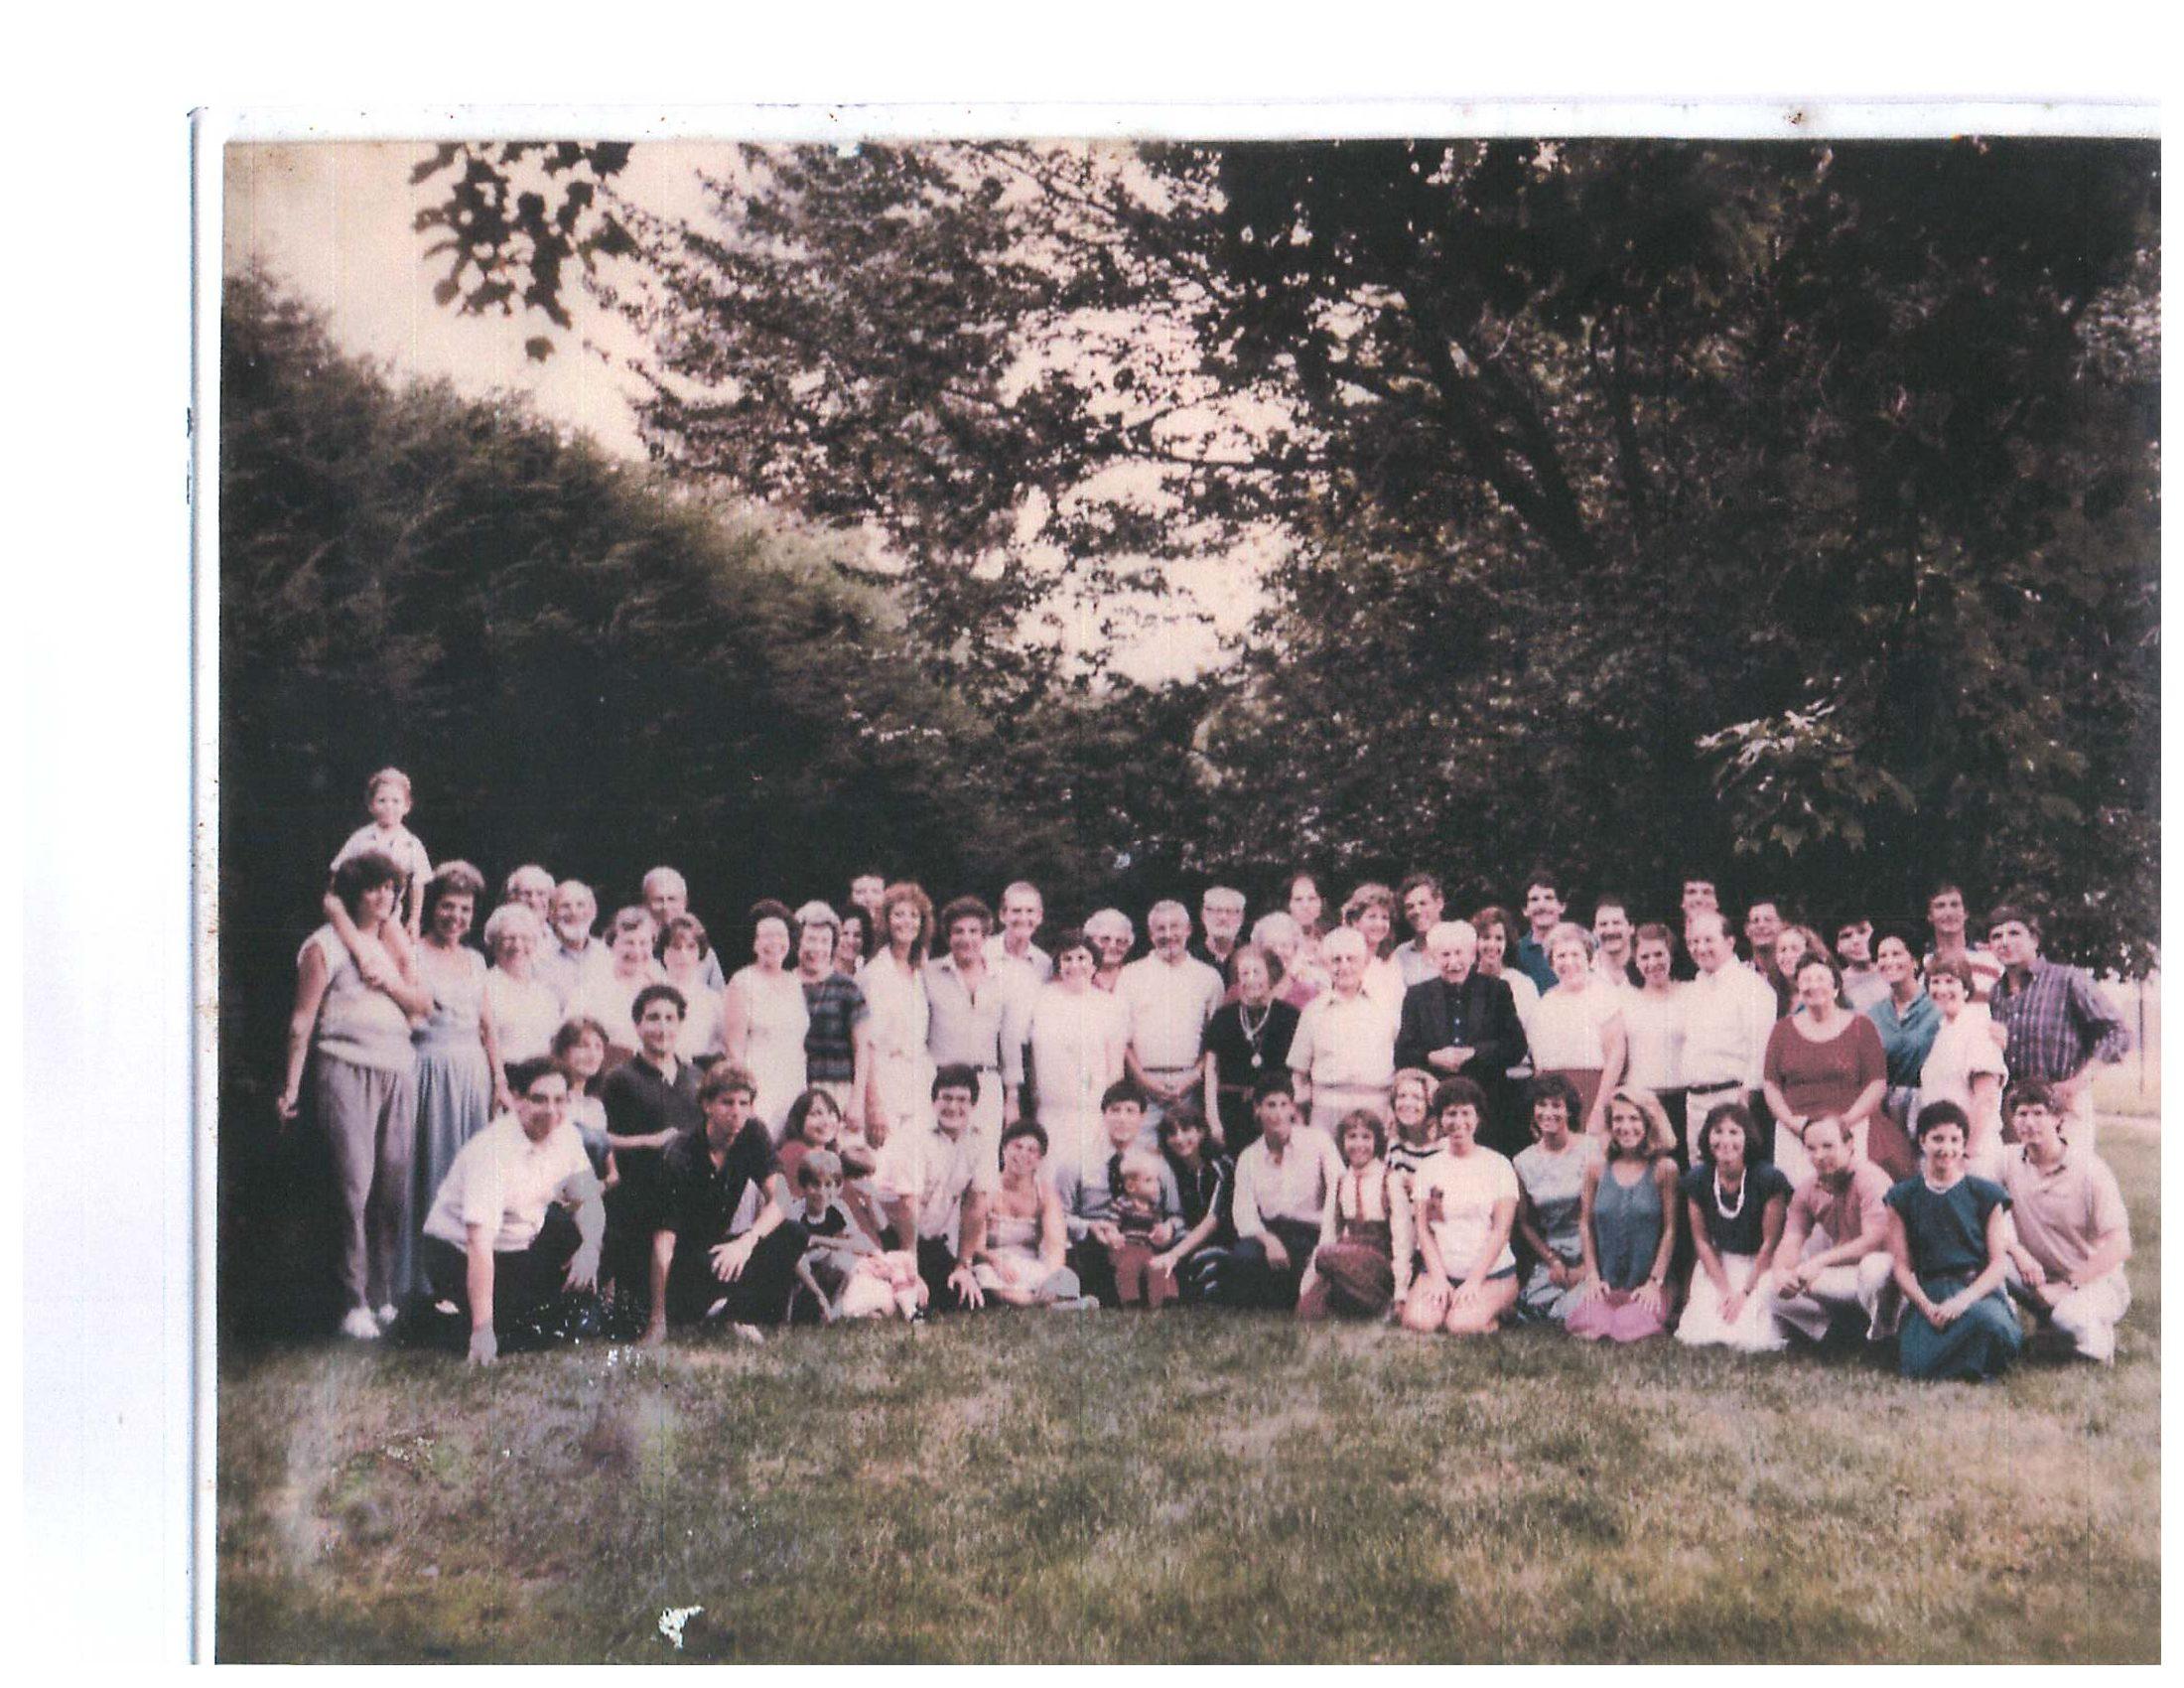 Perelman Family 1986